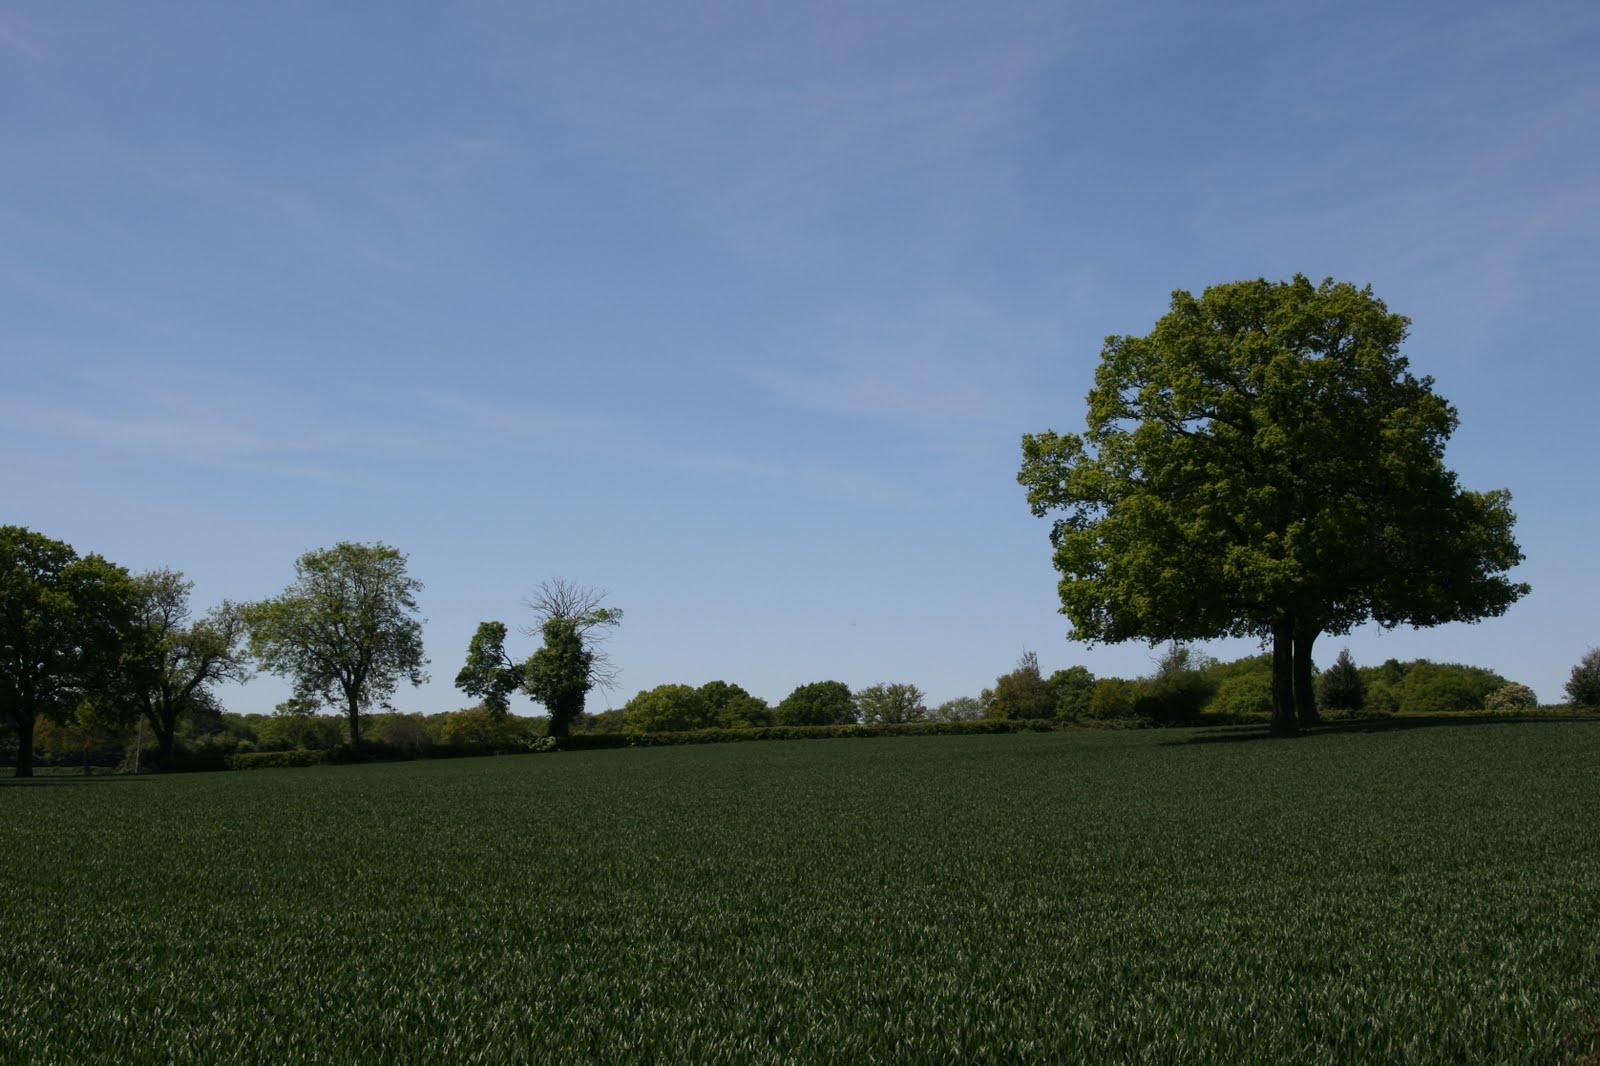 1005 038 Chesham to Great Missenden, England Tree in a field